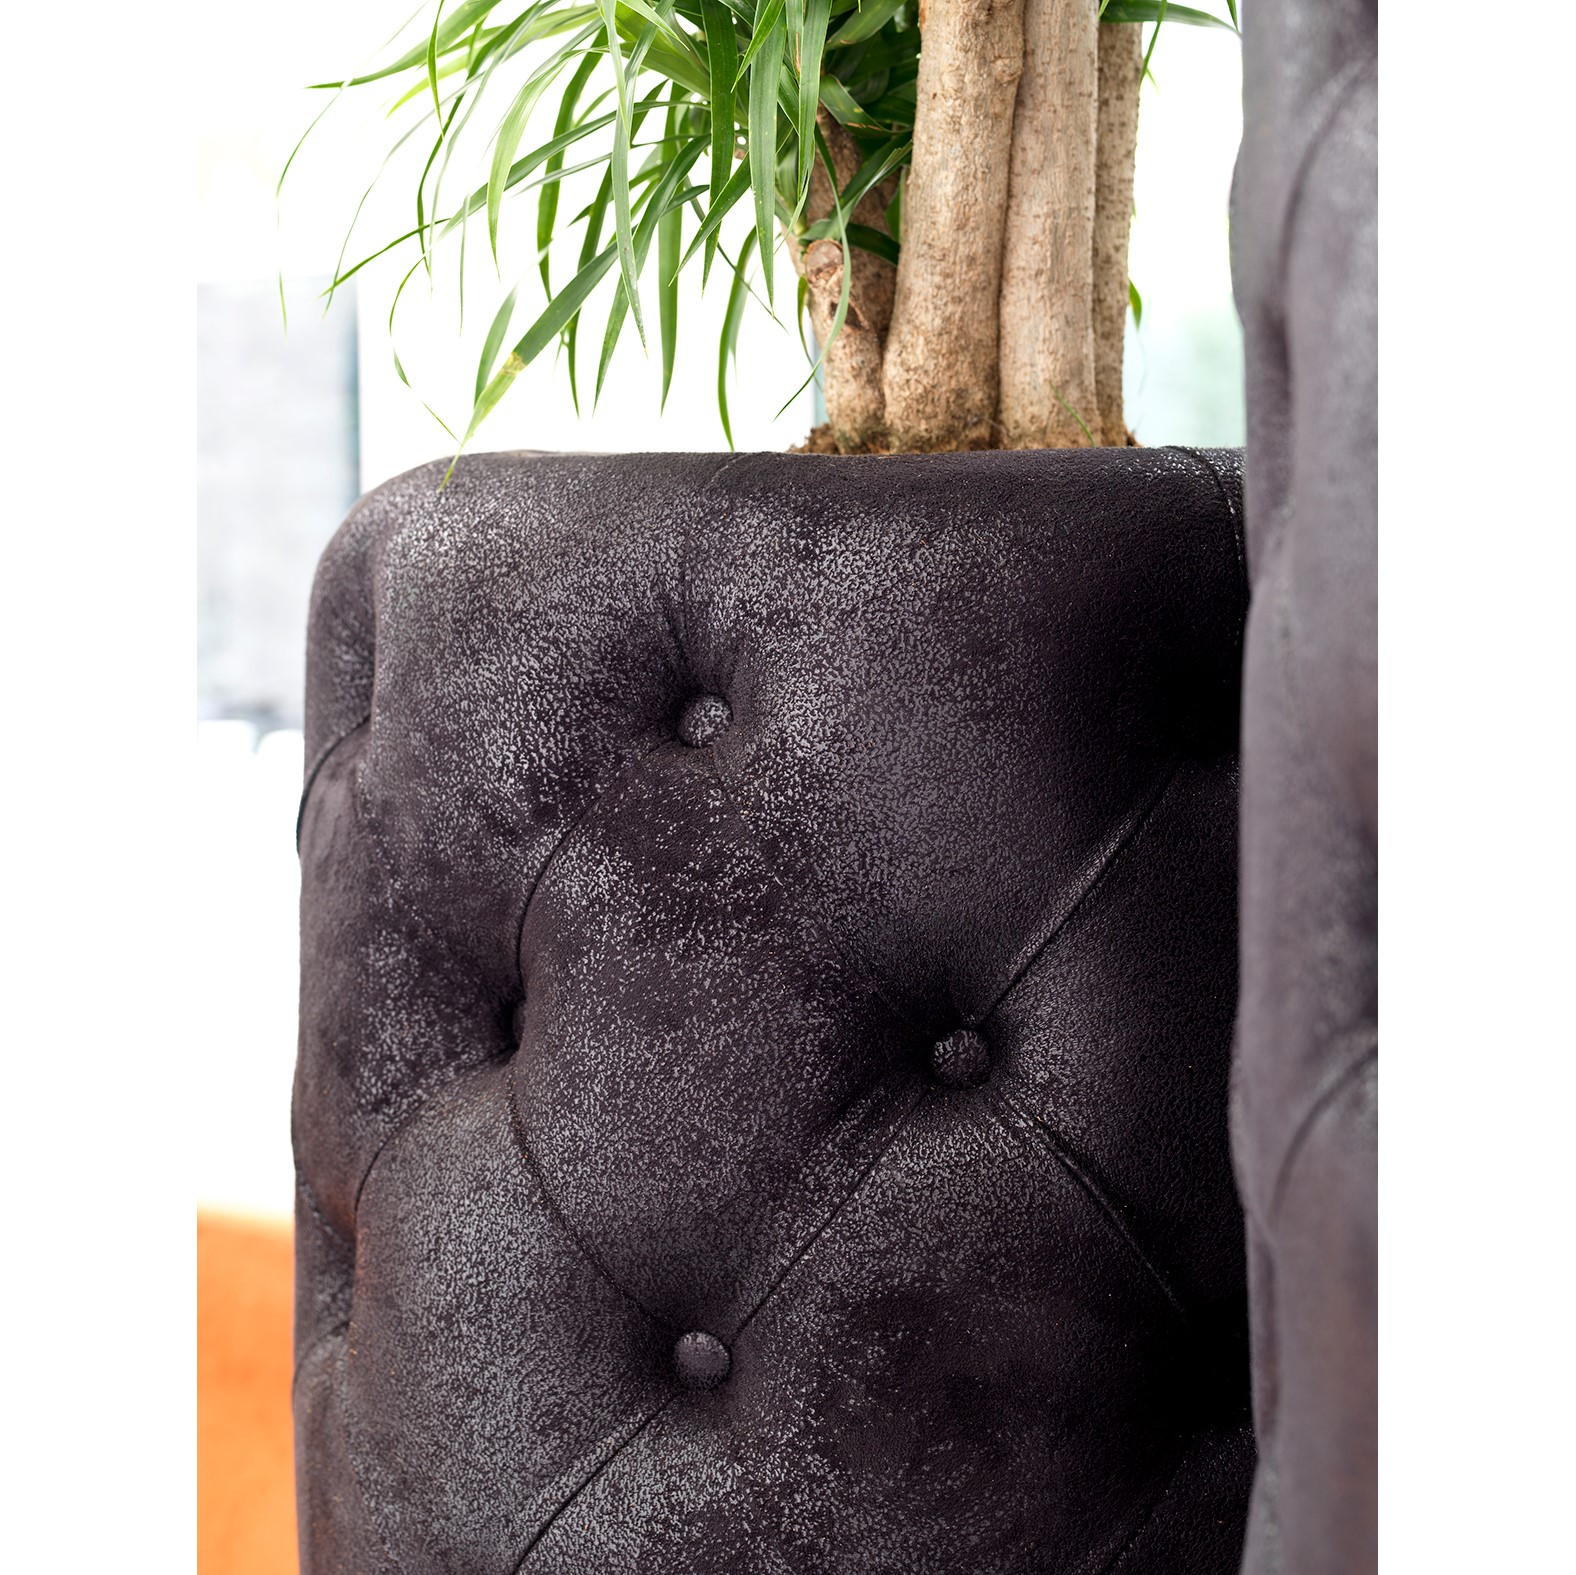 club kunstleder xxl pflanzvase turmalin black terrapalme. Black Bedroom Furniture Sets. Home Design Ideas